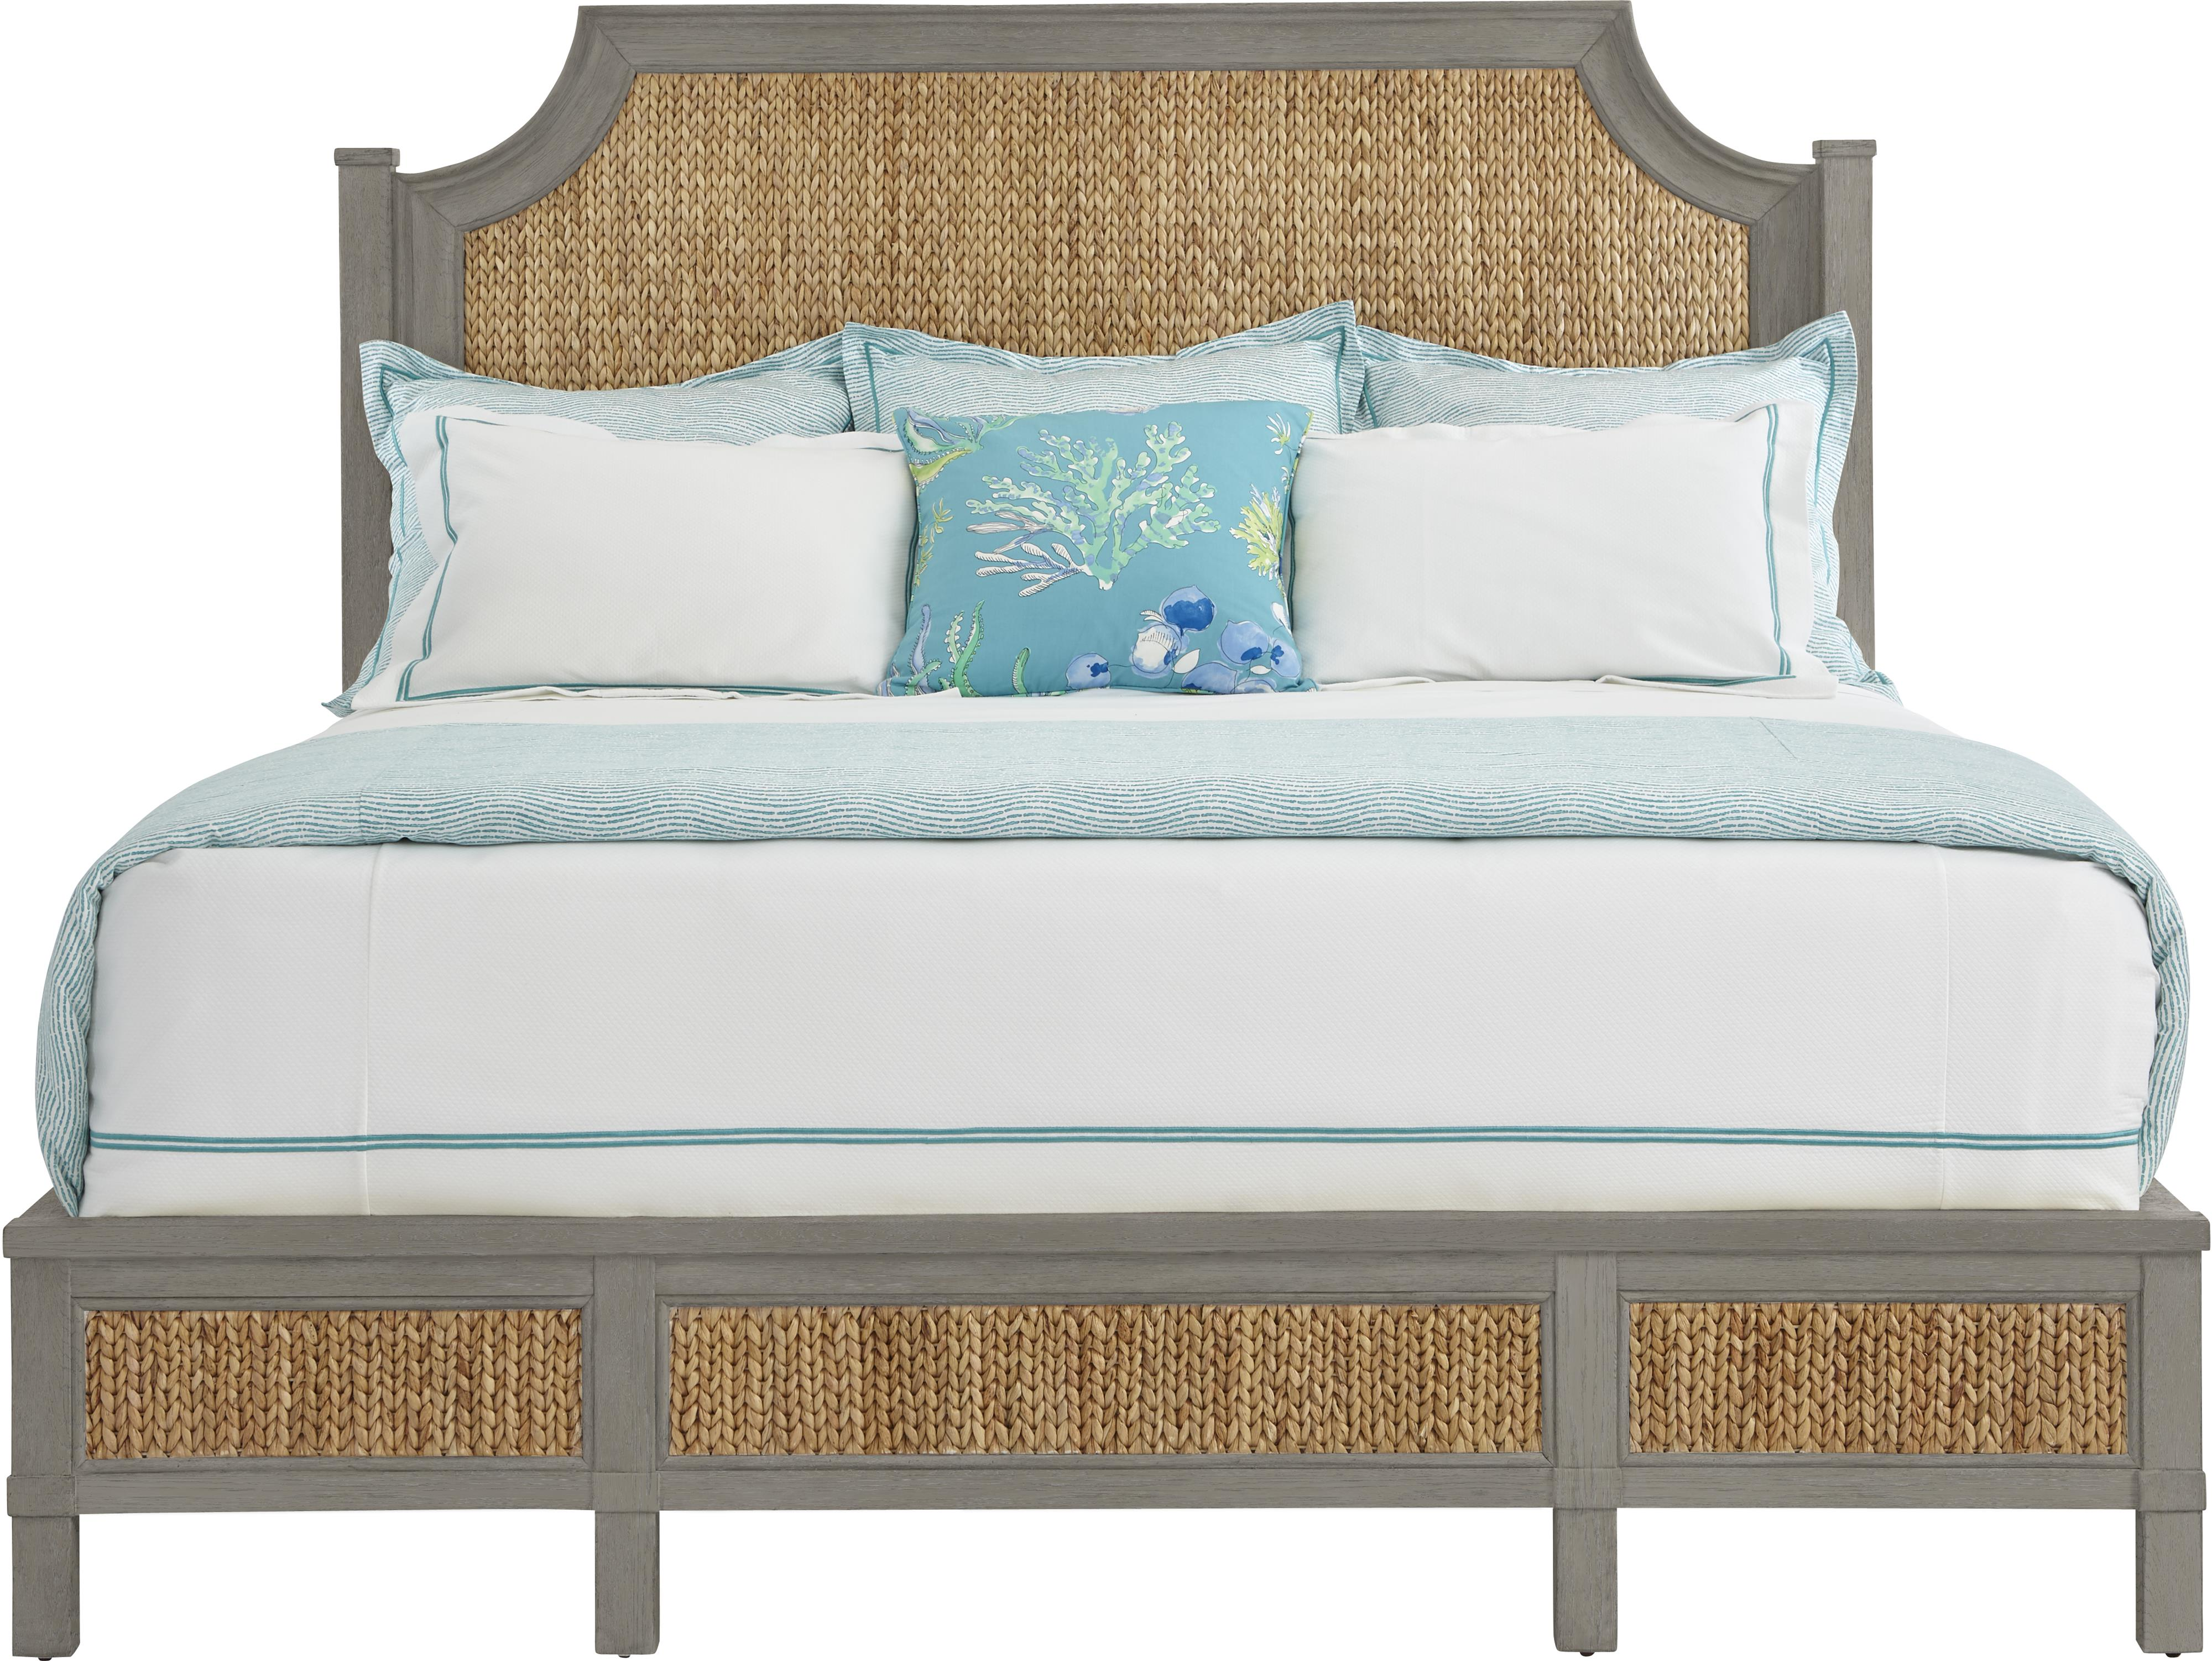 Stanley Furniture Coastal Living Resort King Water Meadow Woven Bed - Item Number: 062-C3-46